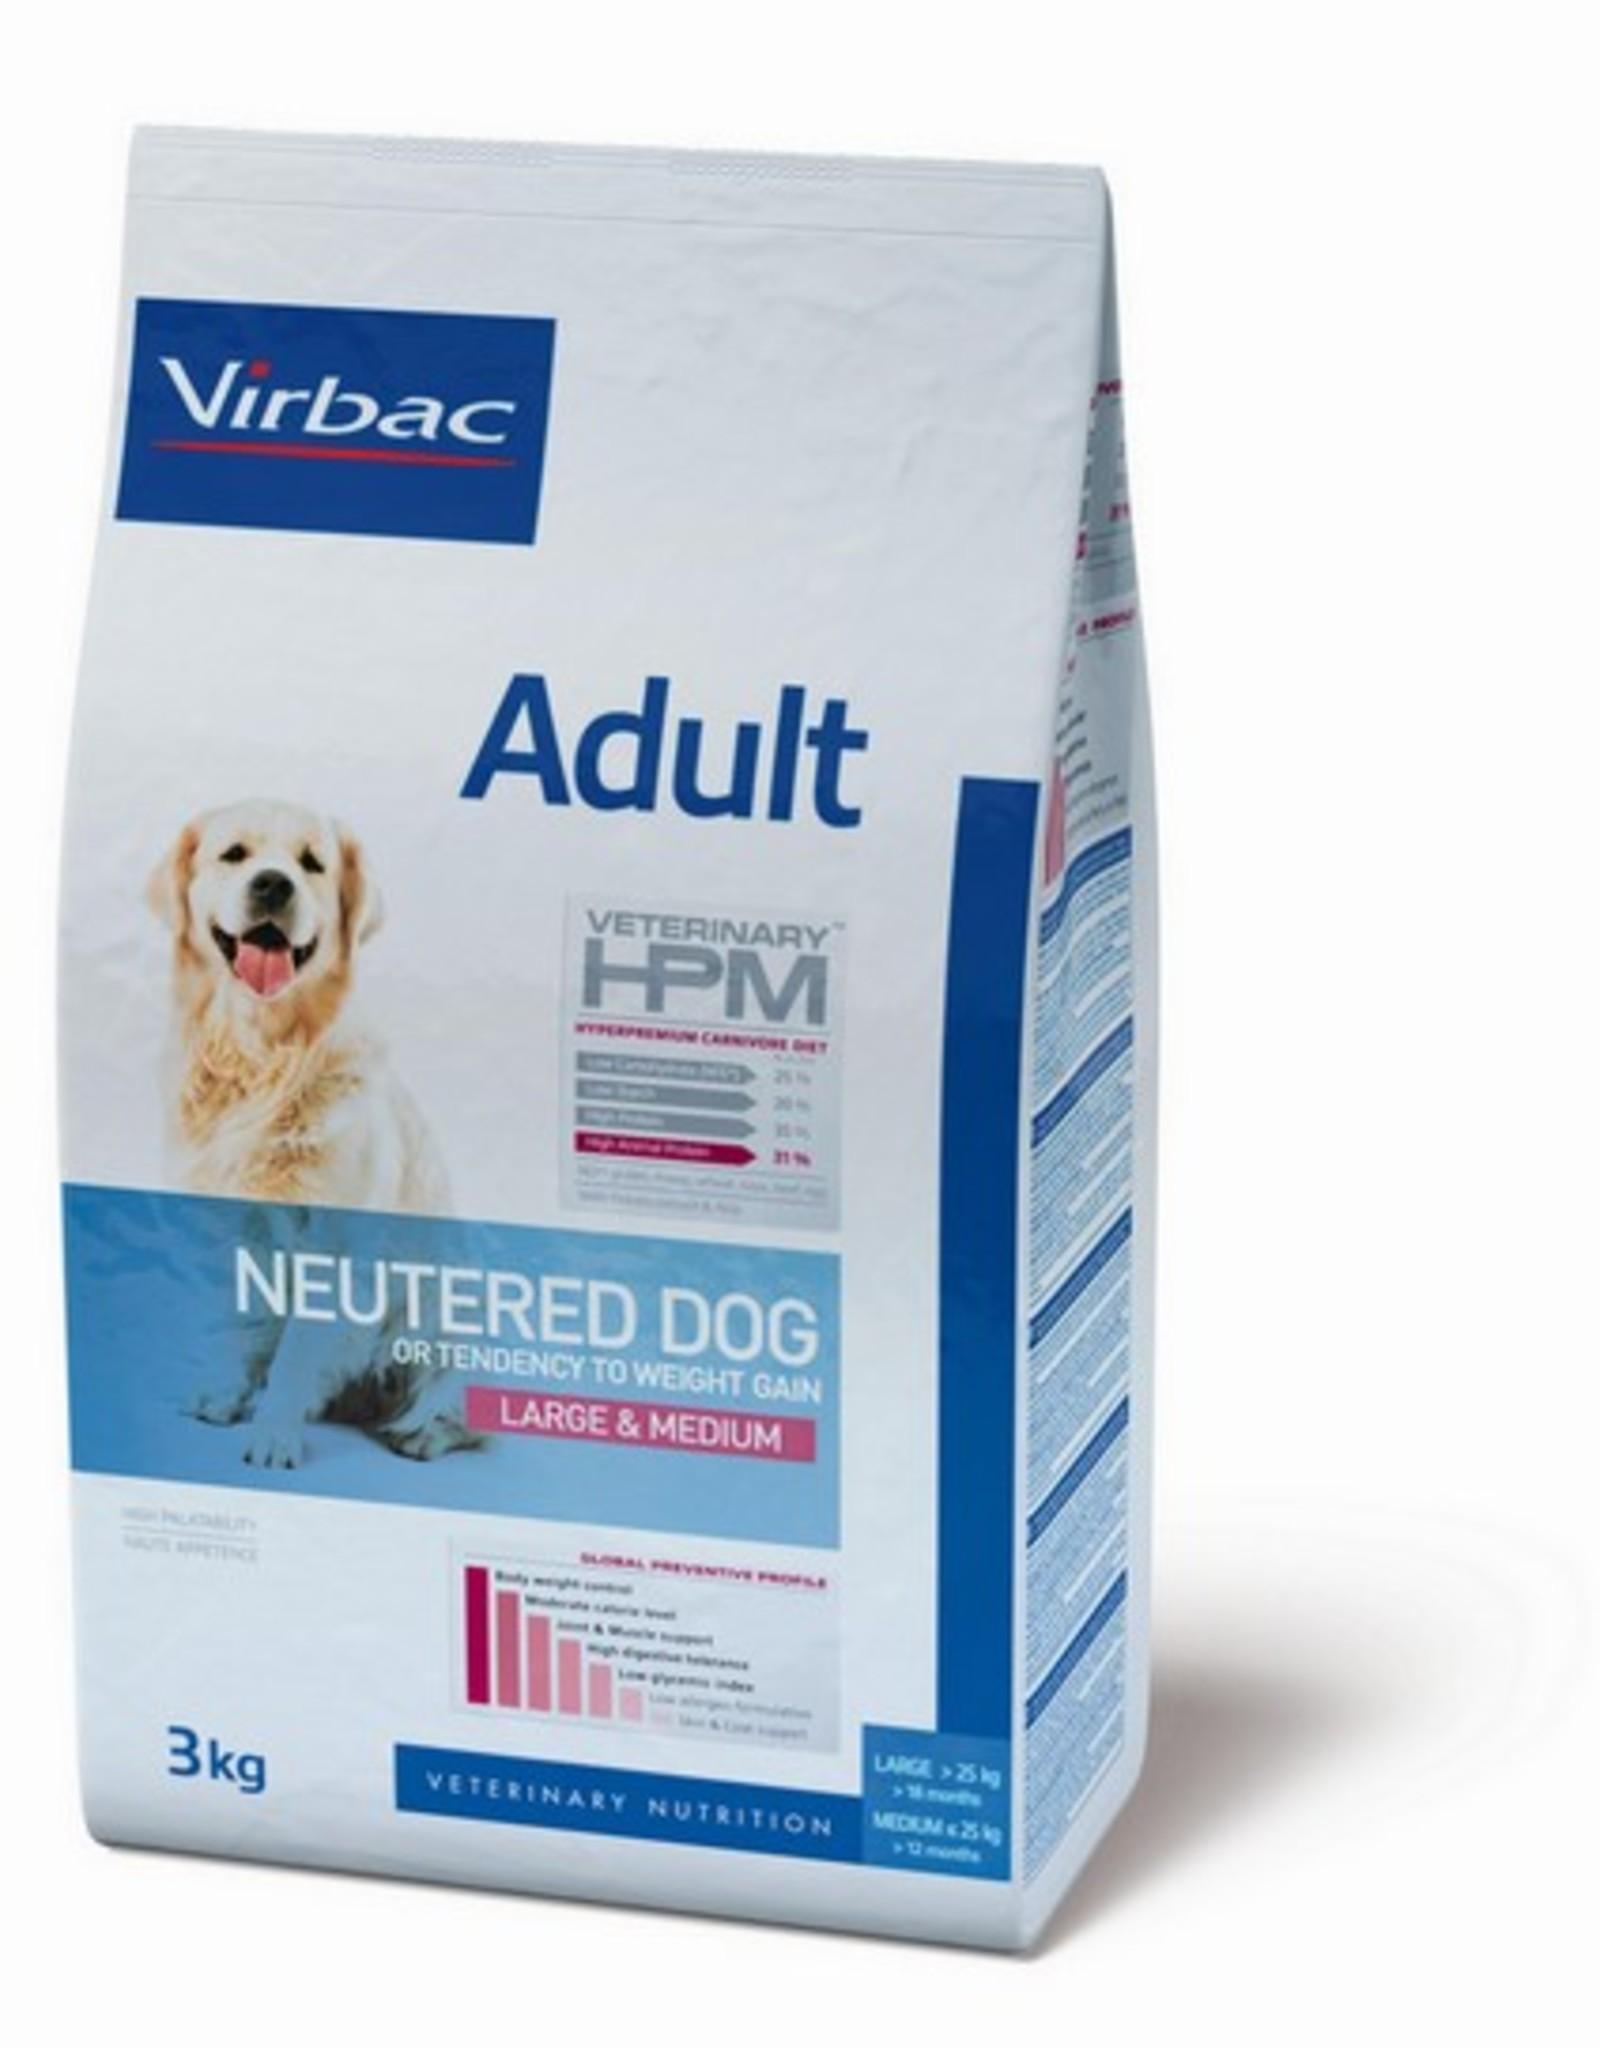 Virbac Virbac Hpm Chien Neutered Adult Large/medium Breed 3kg